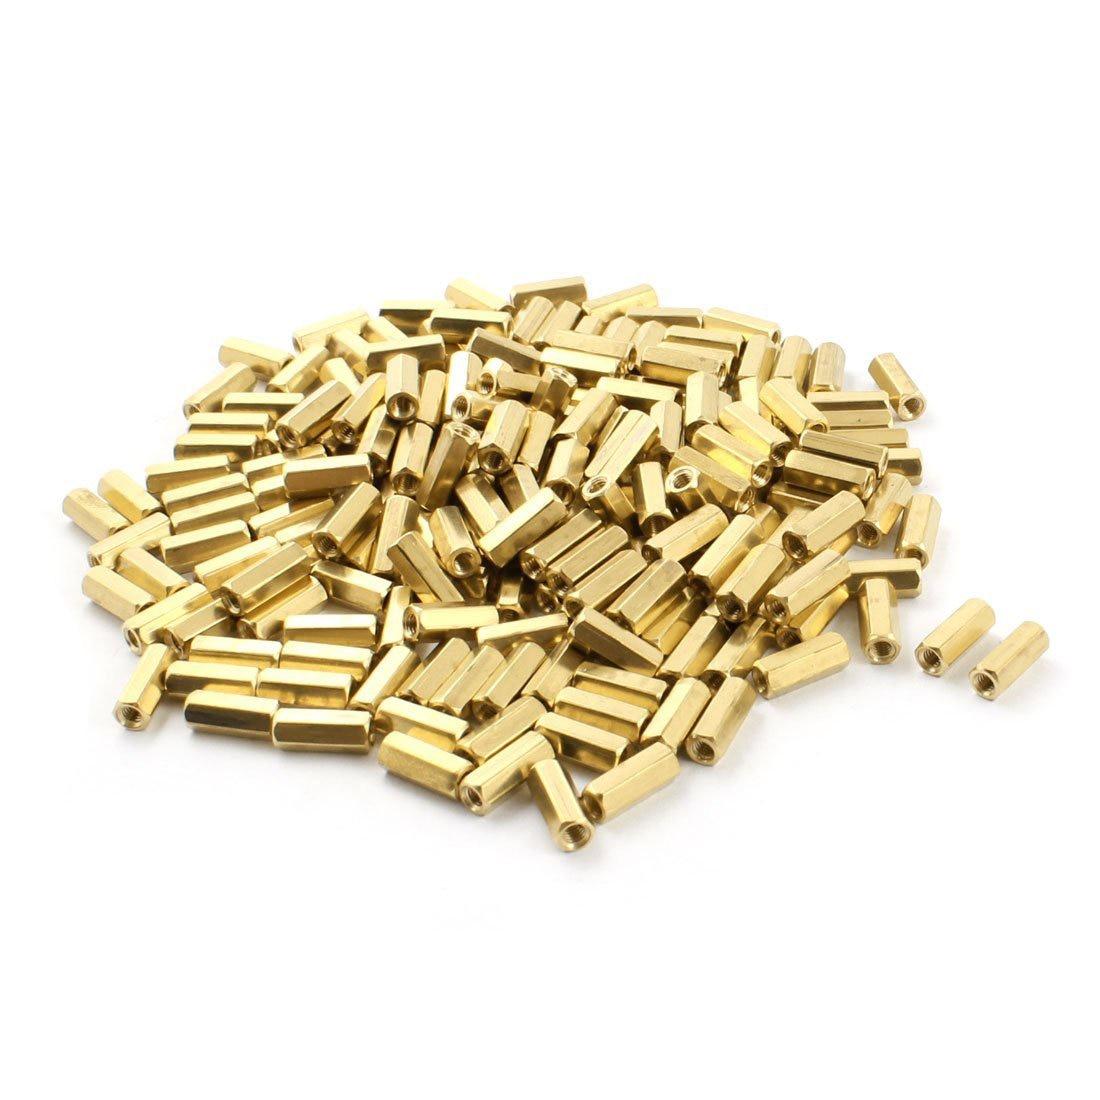 200 x M3 Female Thread Brass Pillar PCB Standoff Hexagonal Spacer 12mm